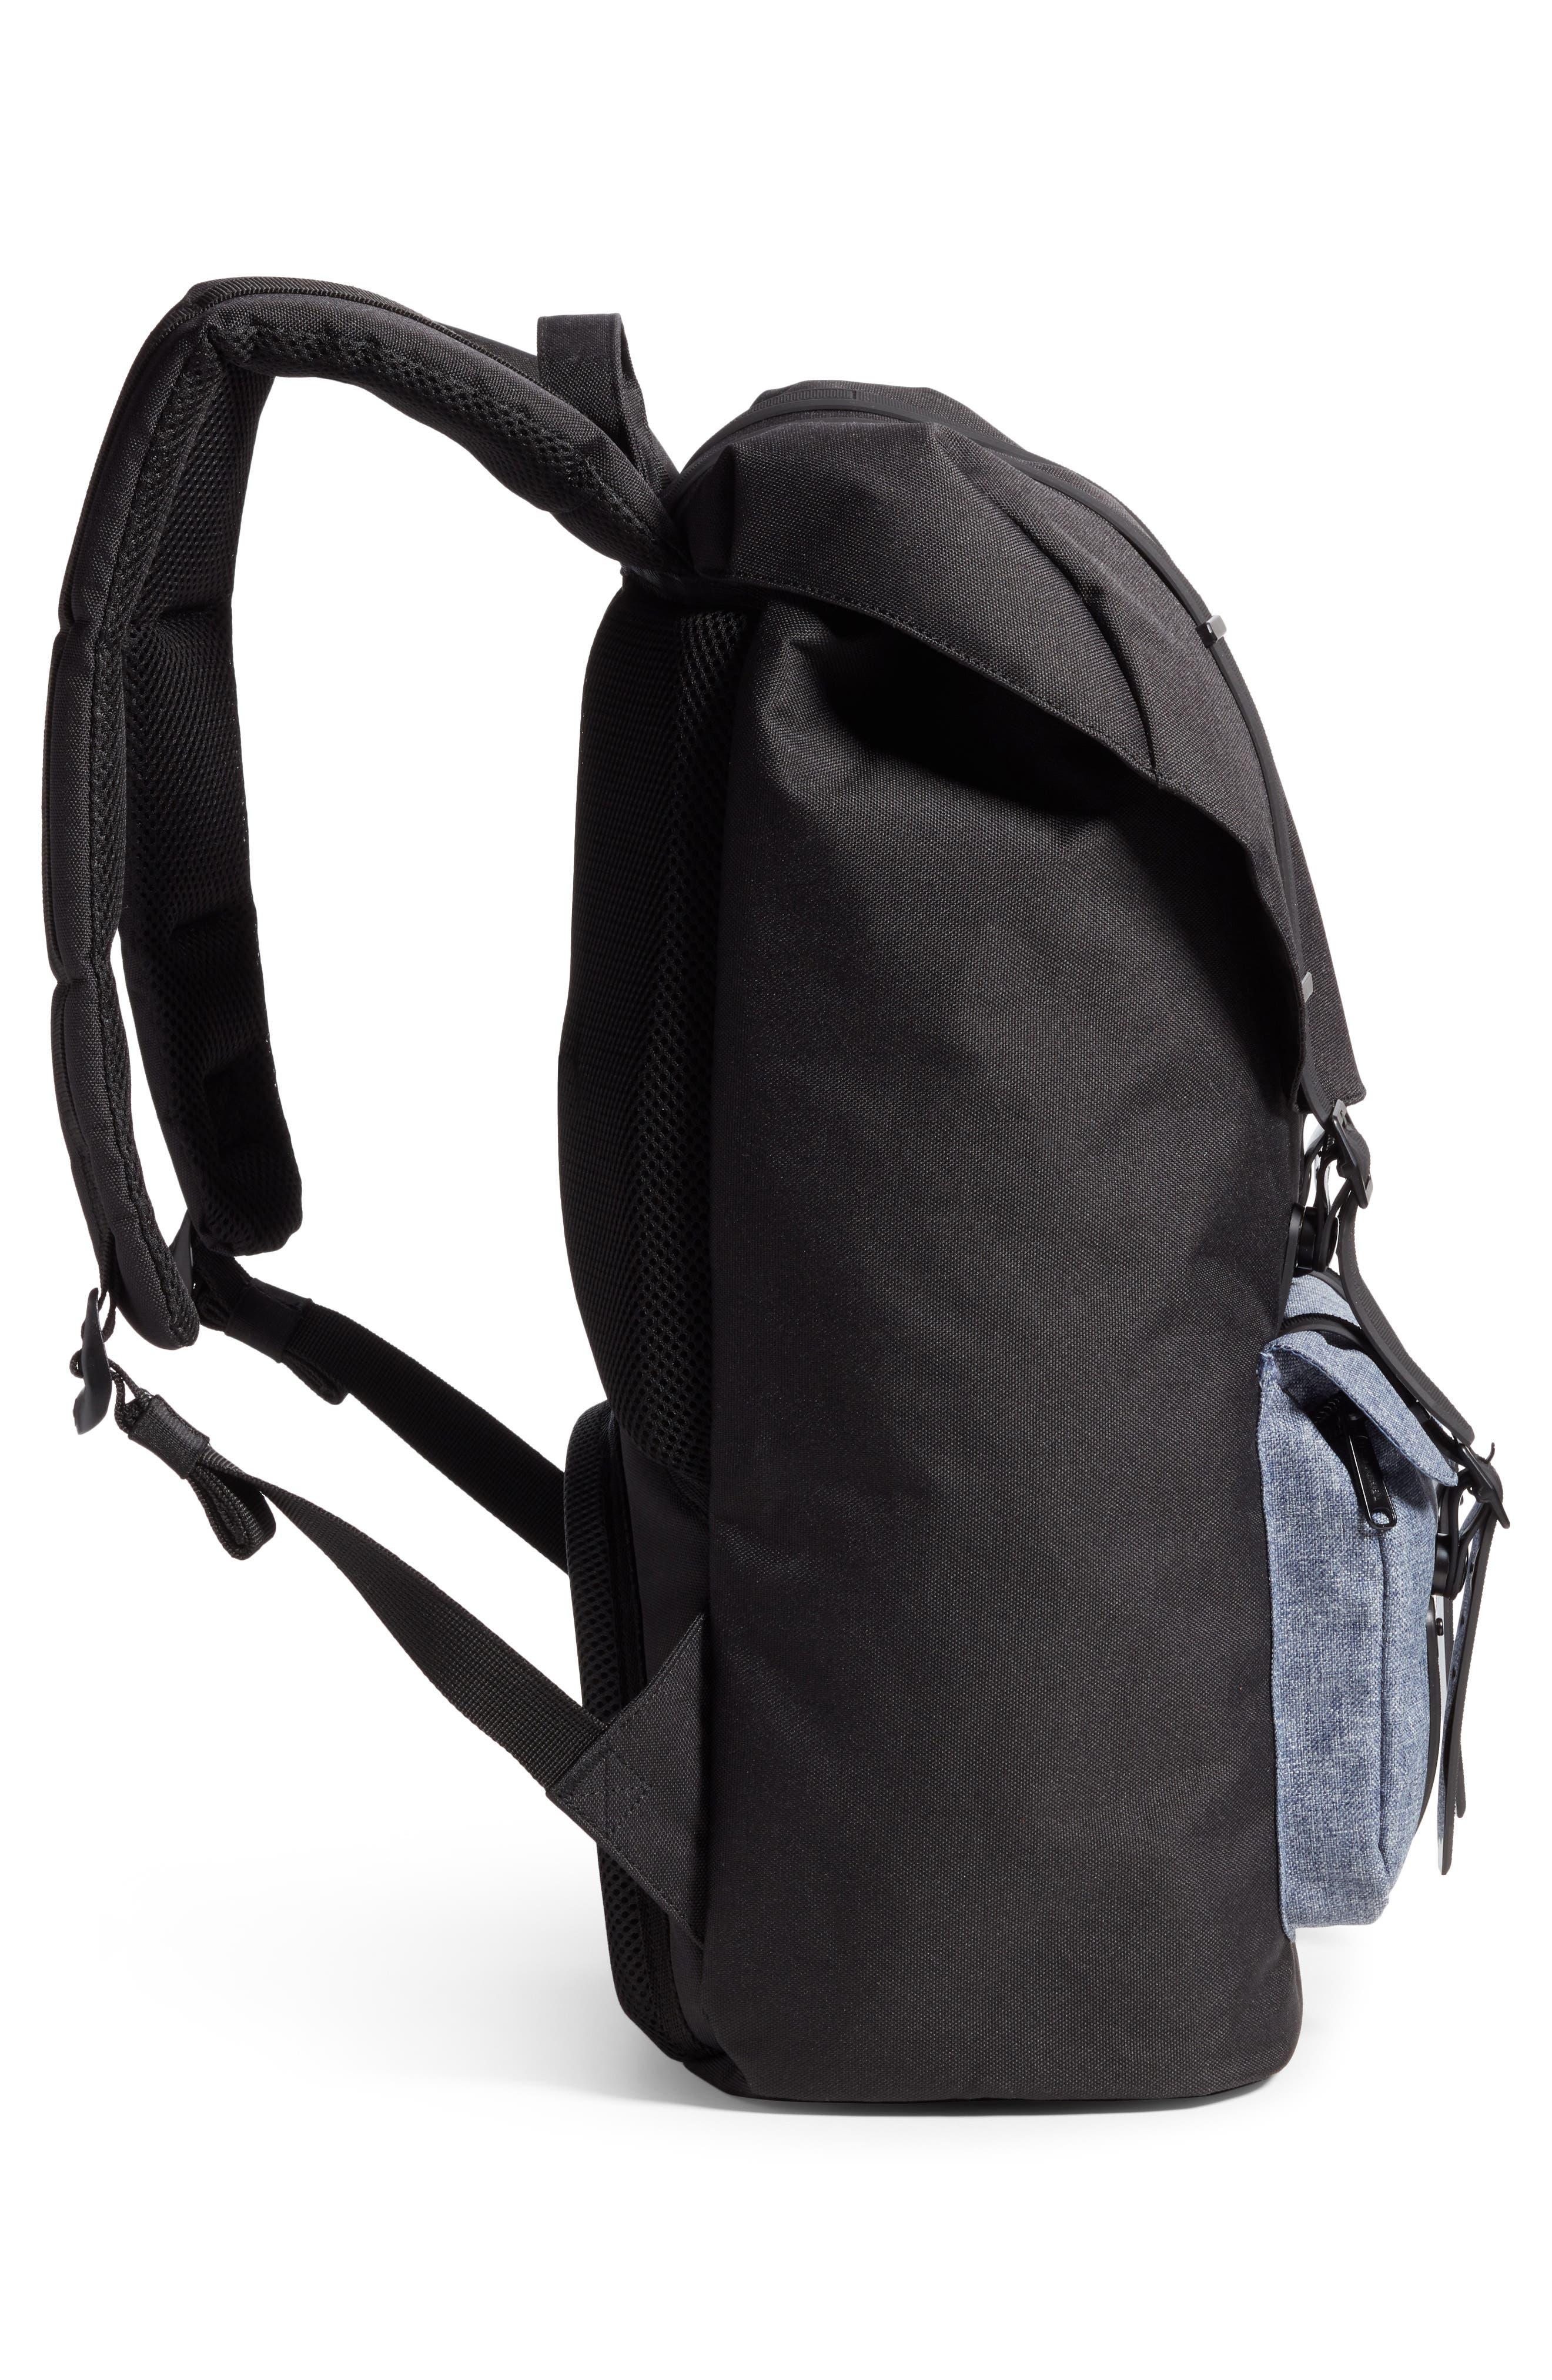 Little America - Chambray Backpack,                             Alternate thumbnail 5, color,                             Black/ Dark Chambray